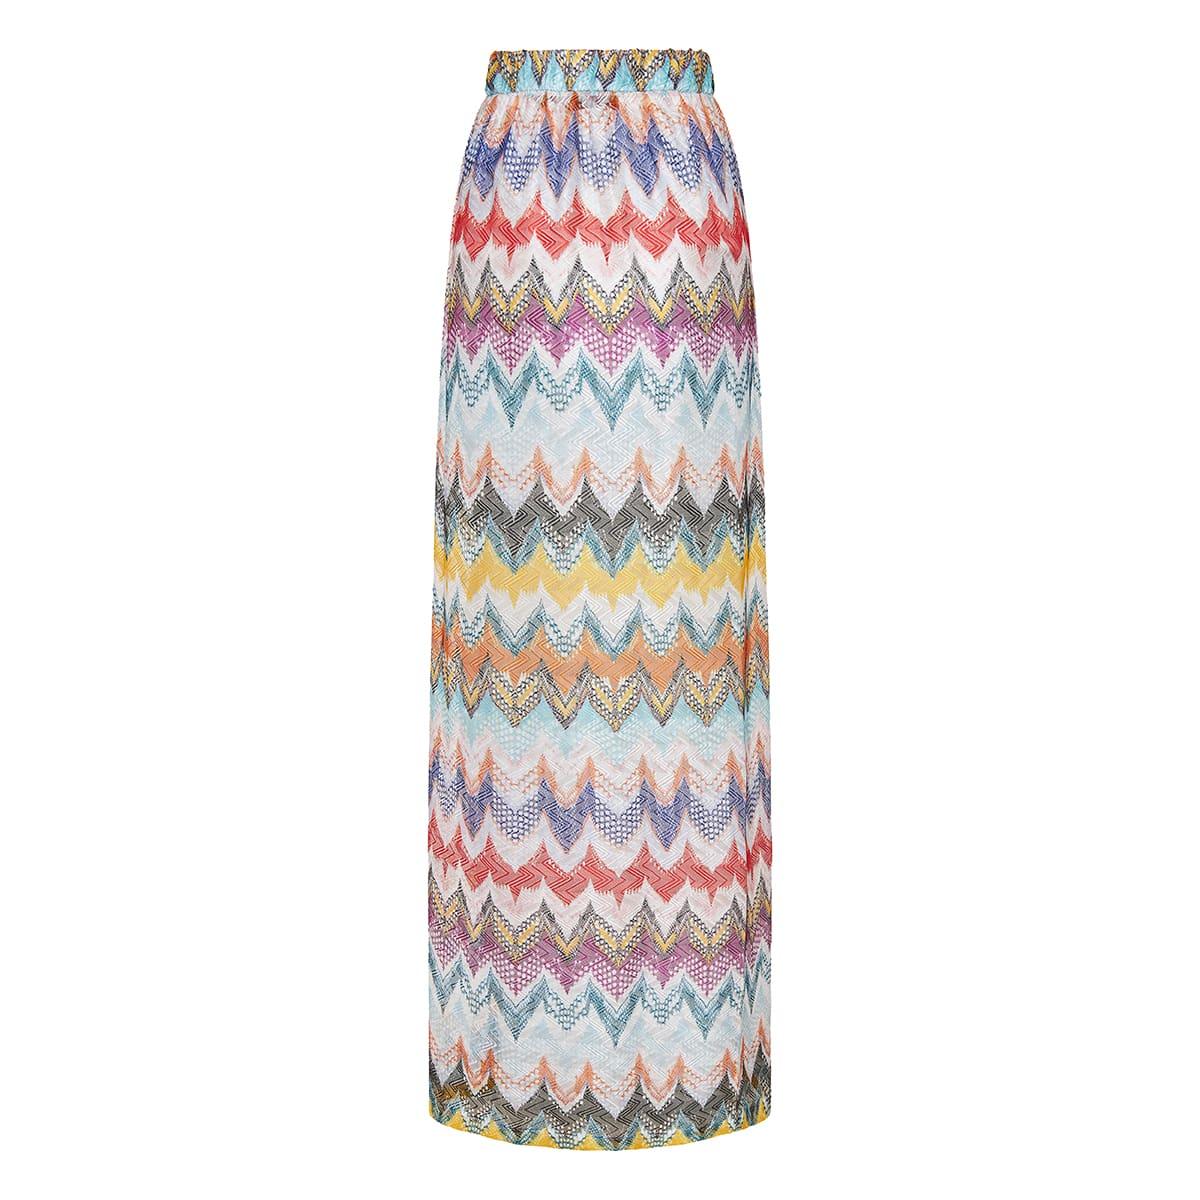 Chevron-knit long skirt